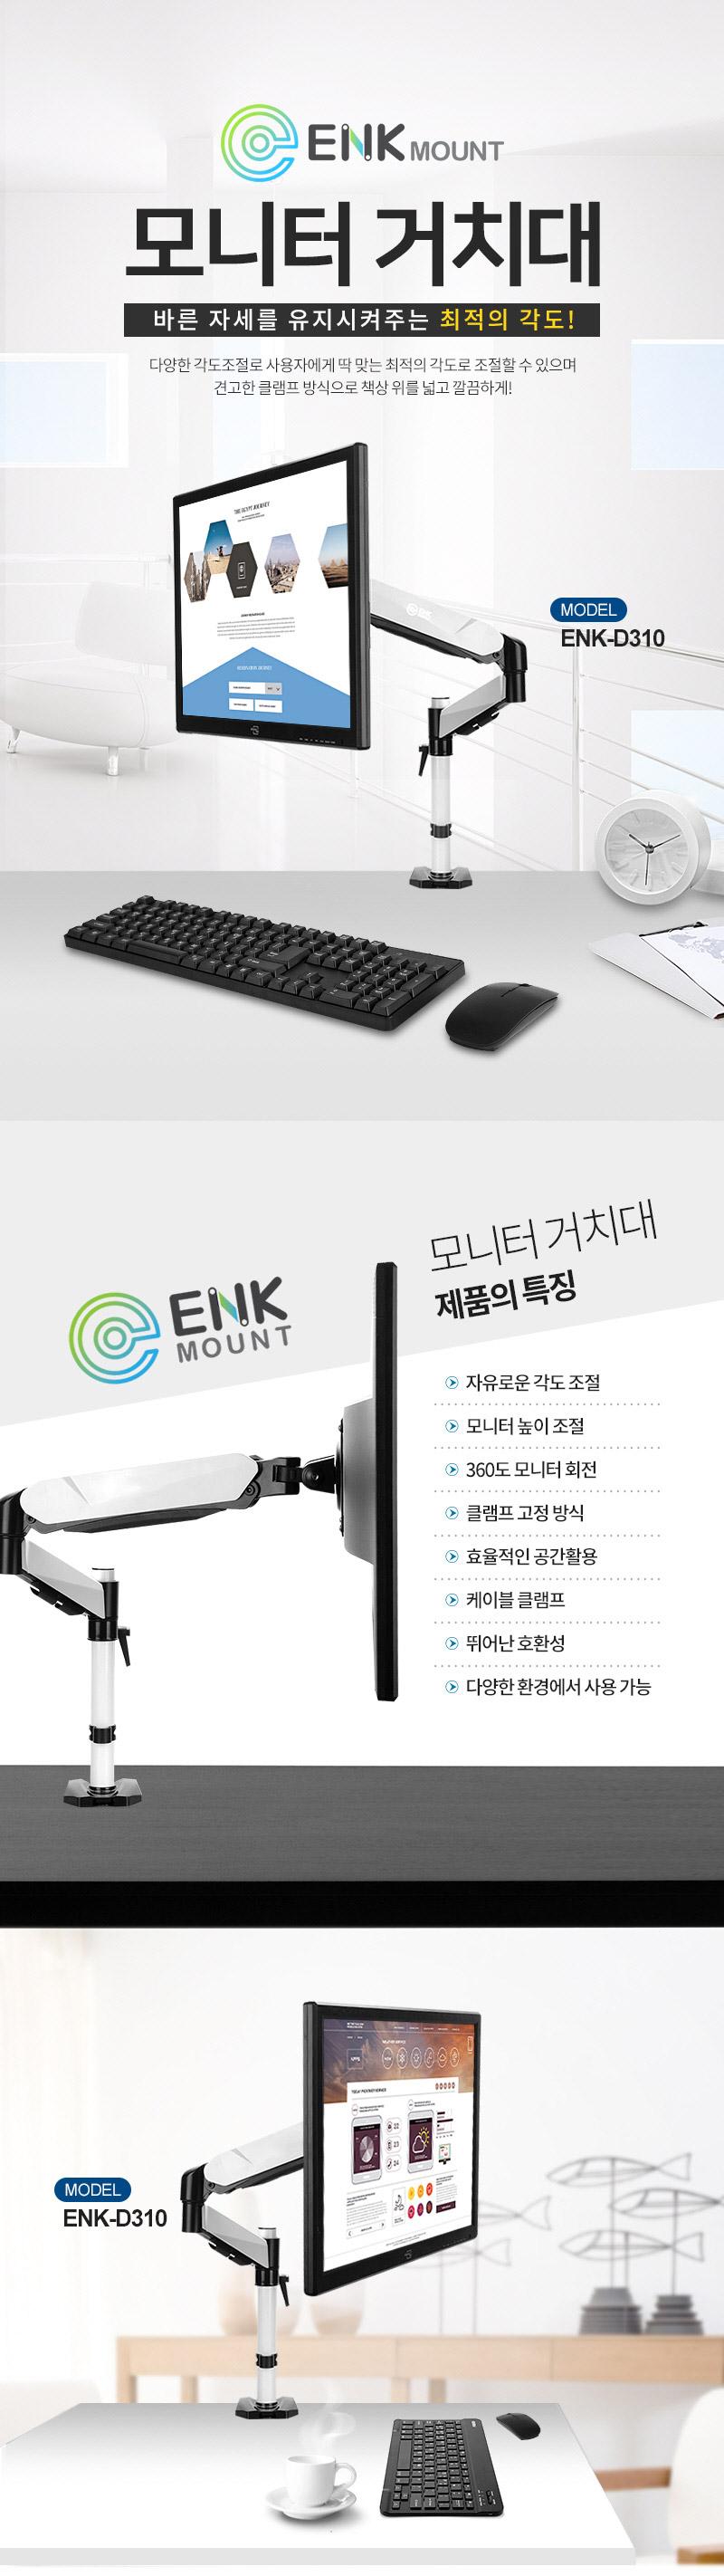 ENK-D310_01.jpg